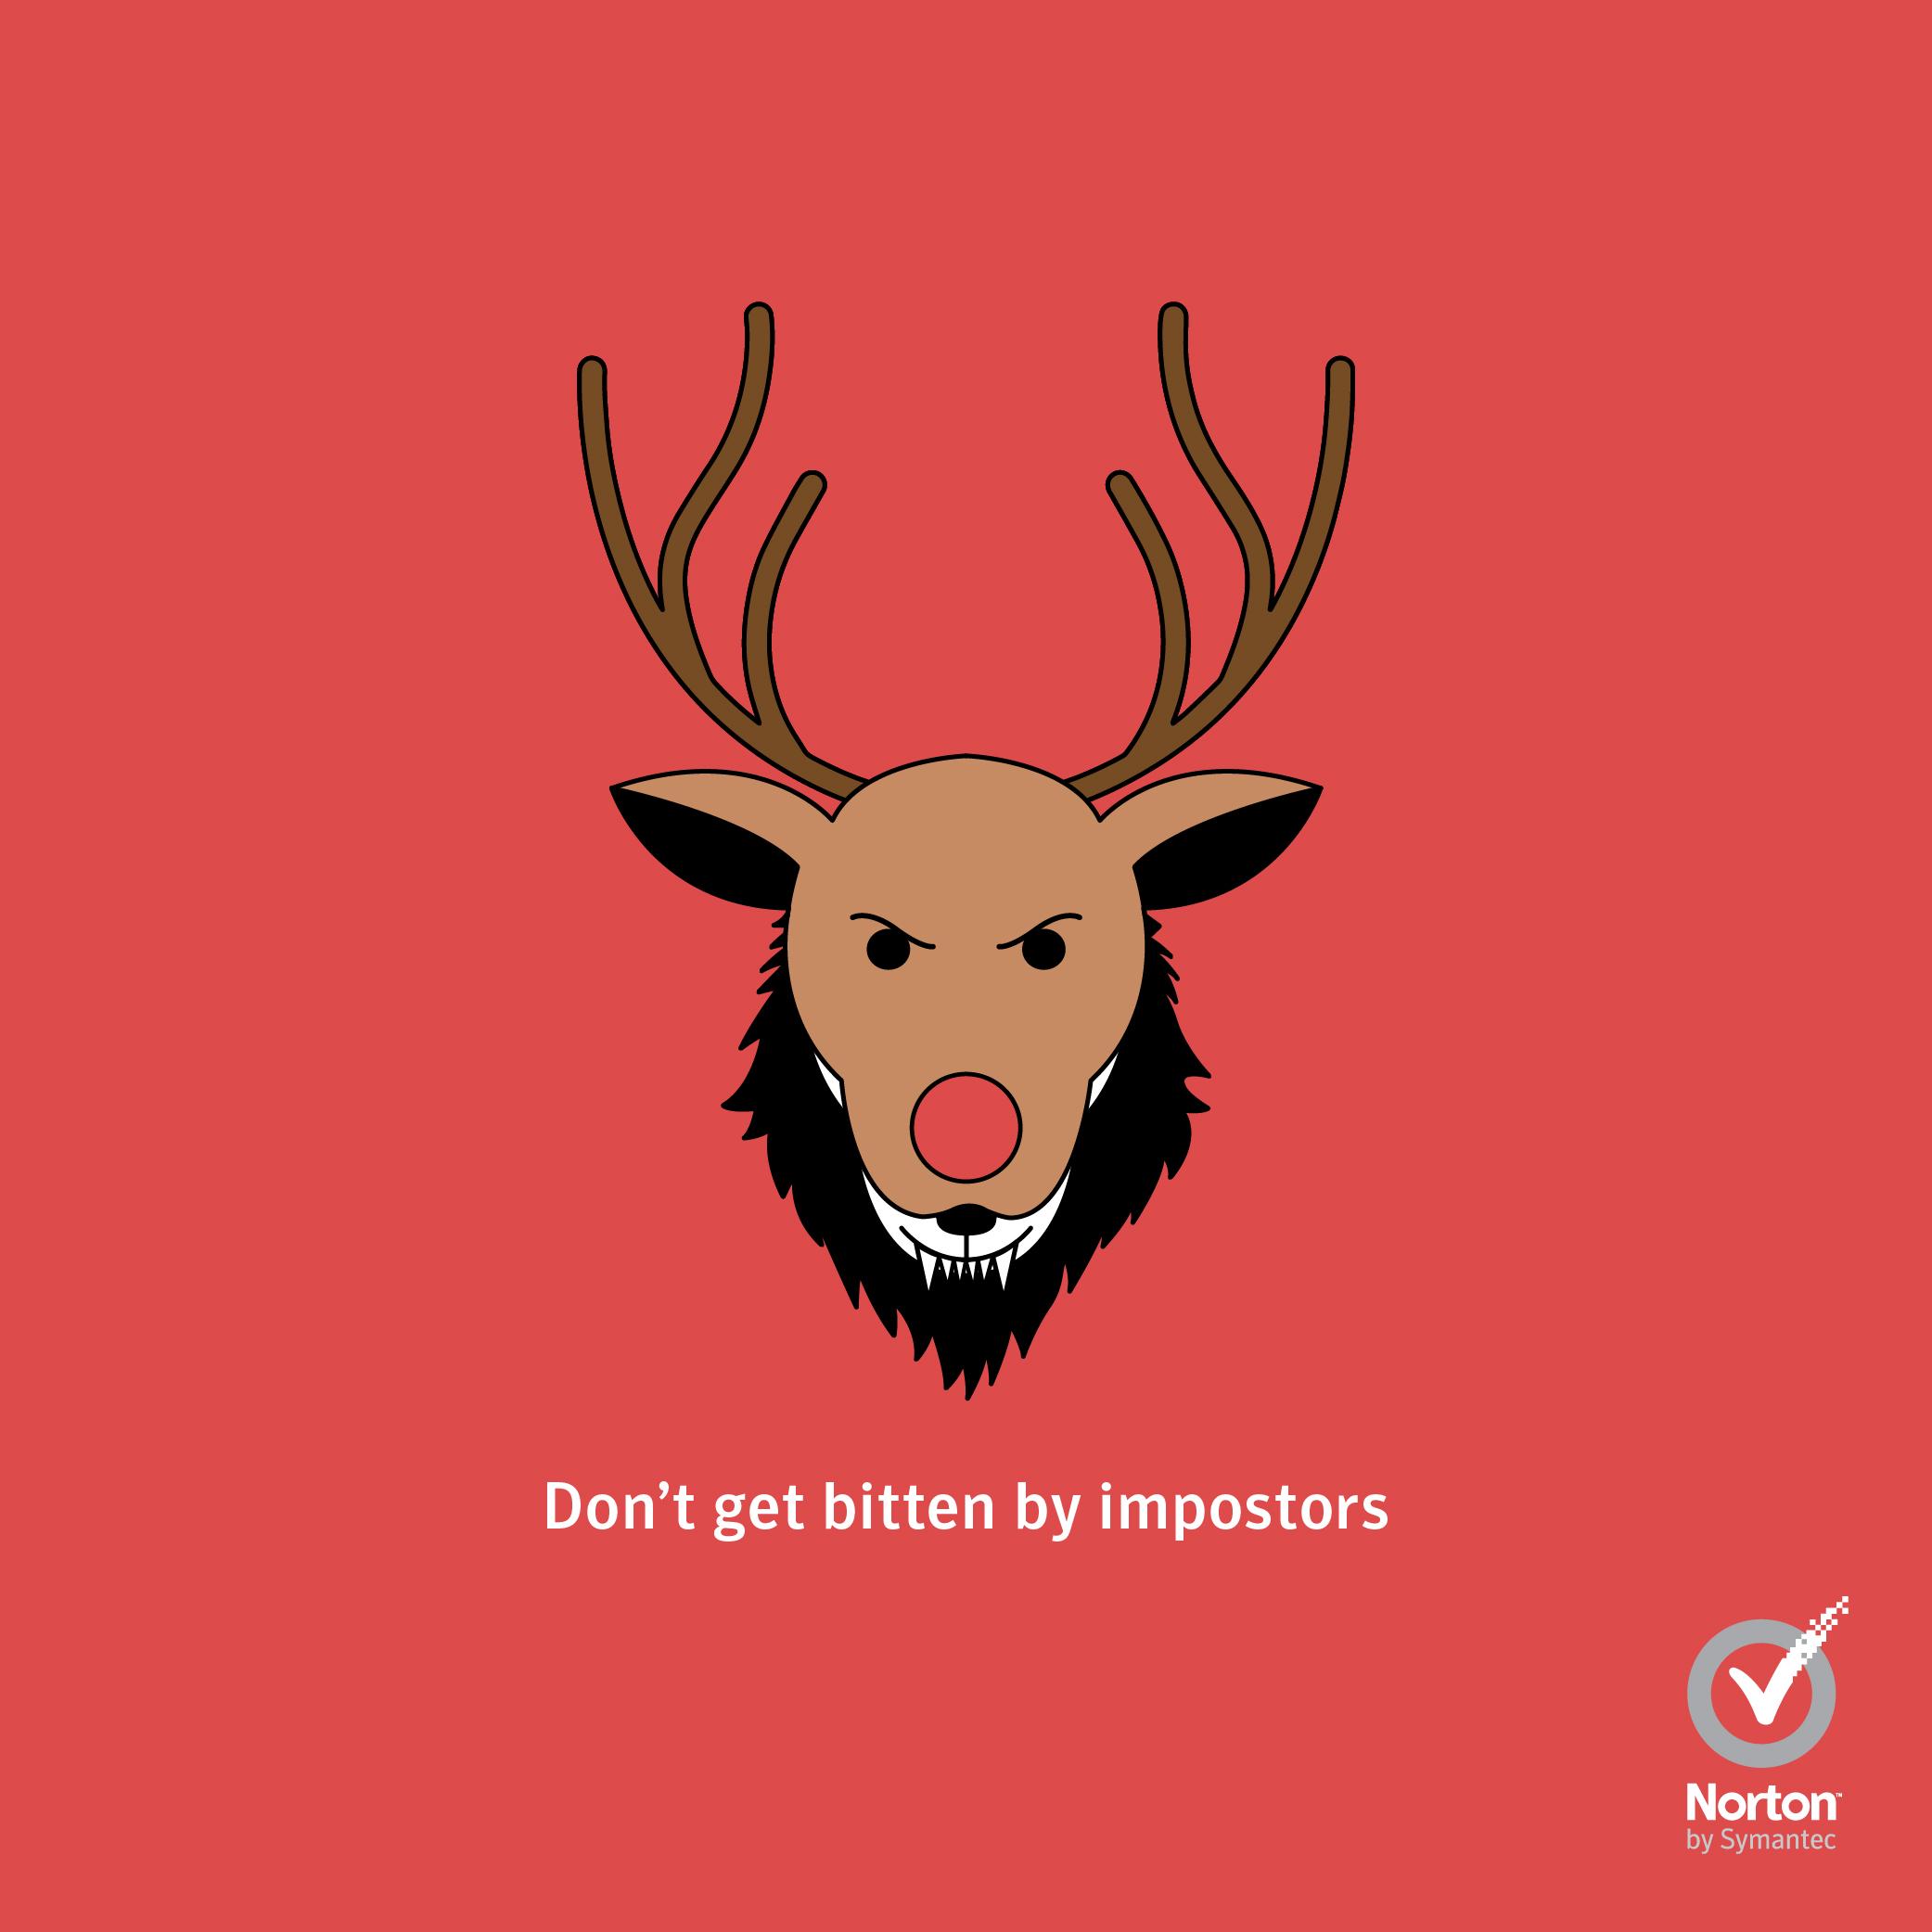 Norton Christmas_Fake Antivirus Software.jpg